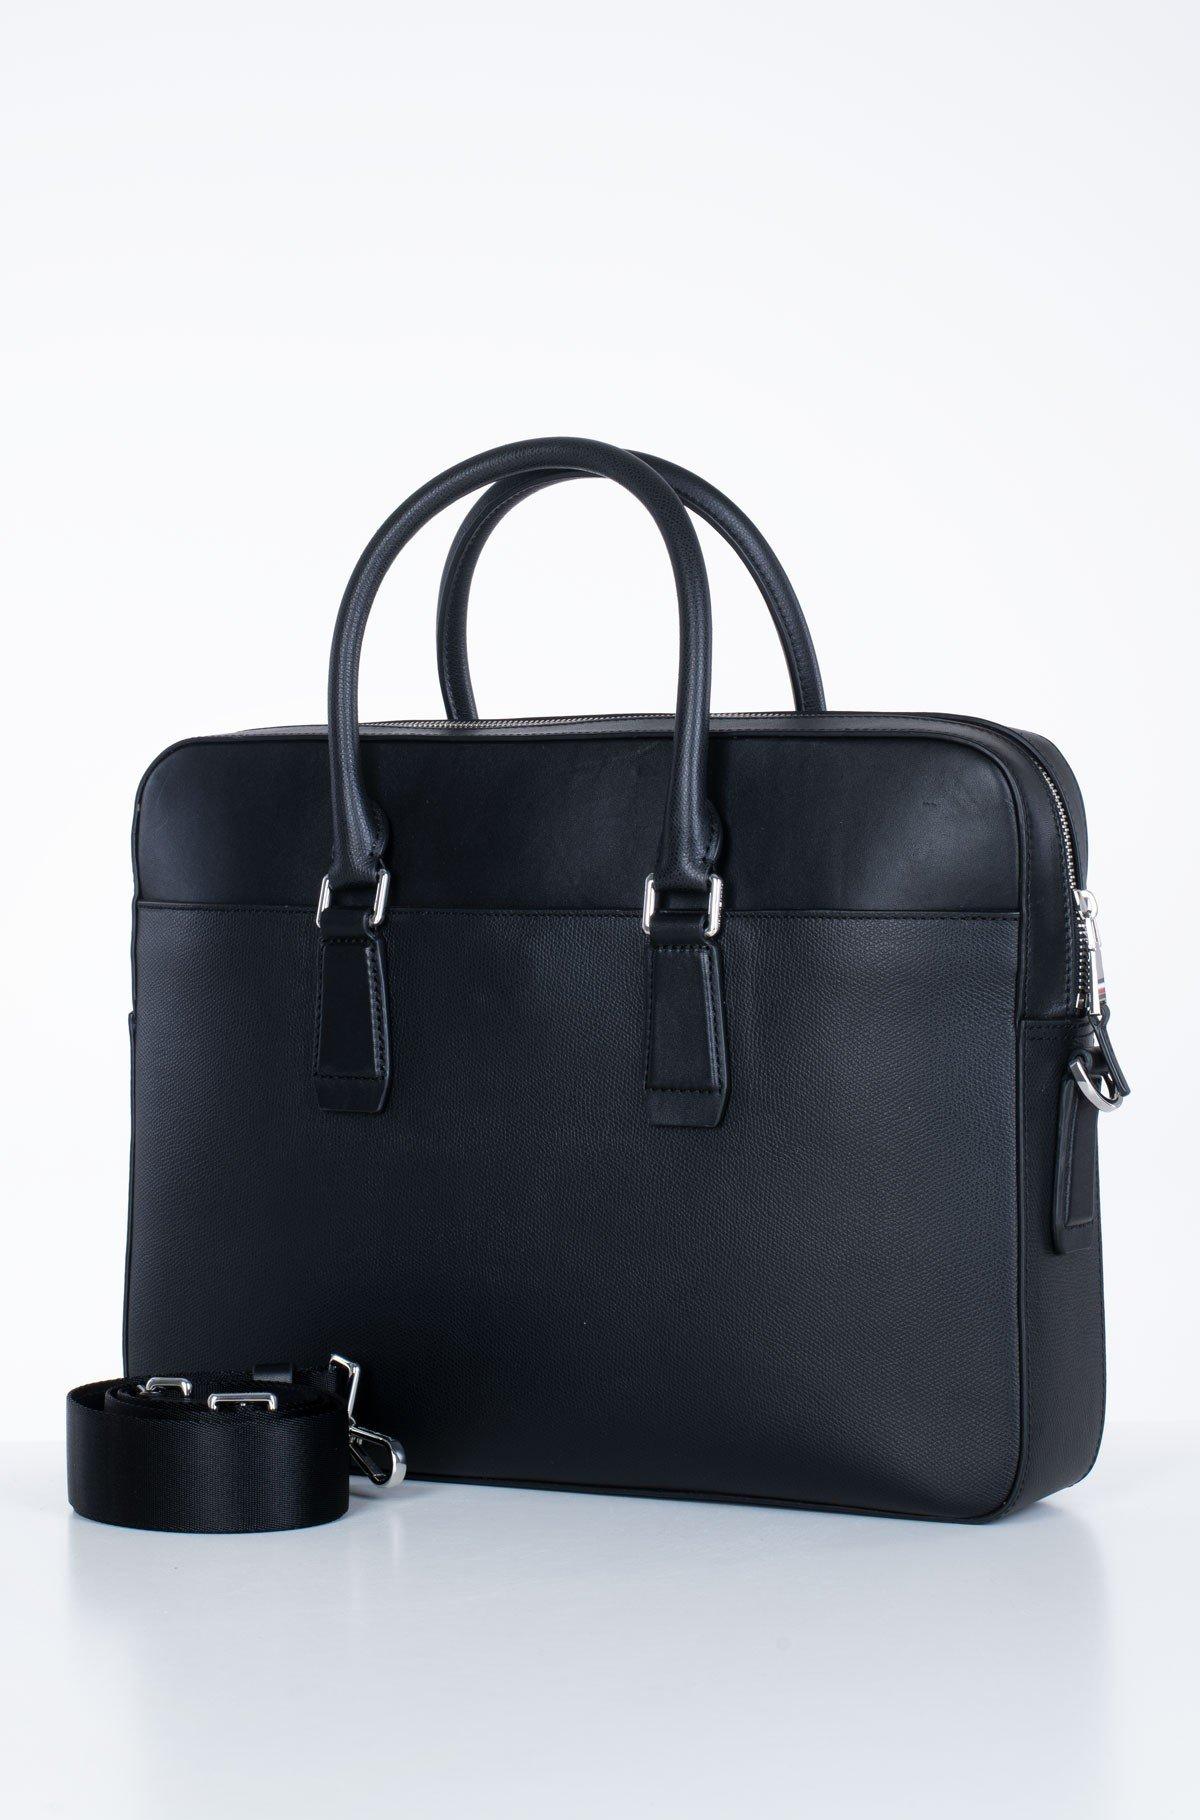 Kompiuterio krepšys  BUSINESS LEATHER SLIM COMP BAG-full-2